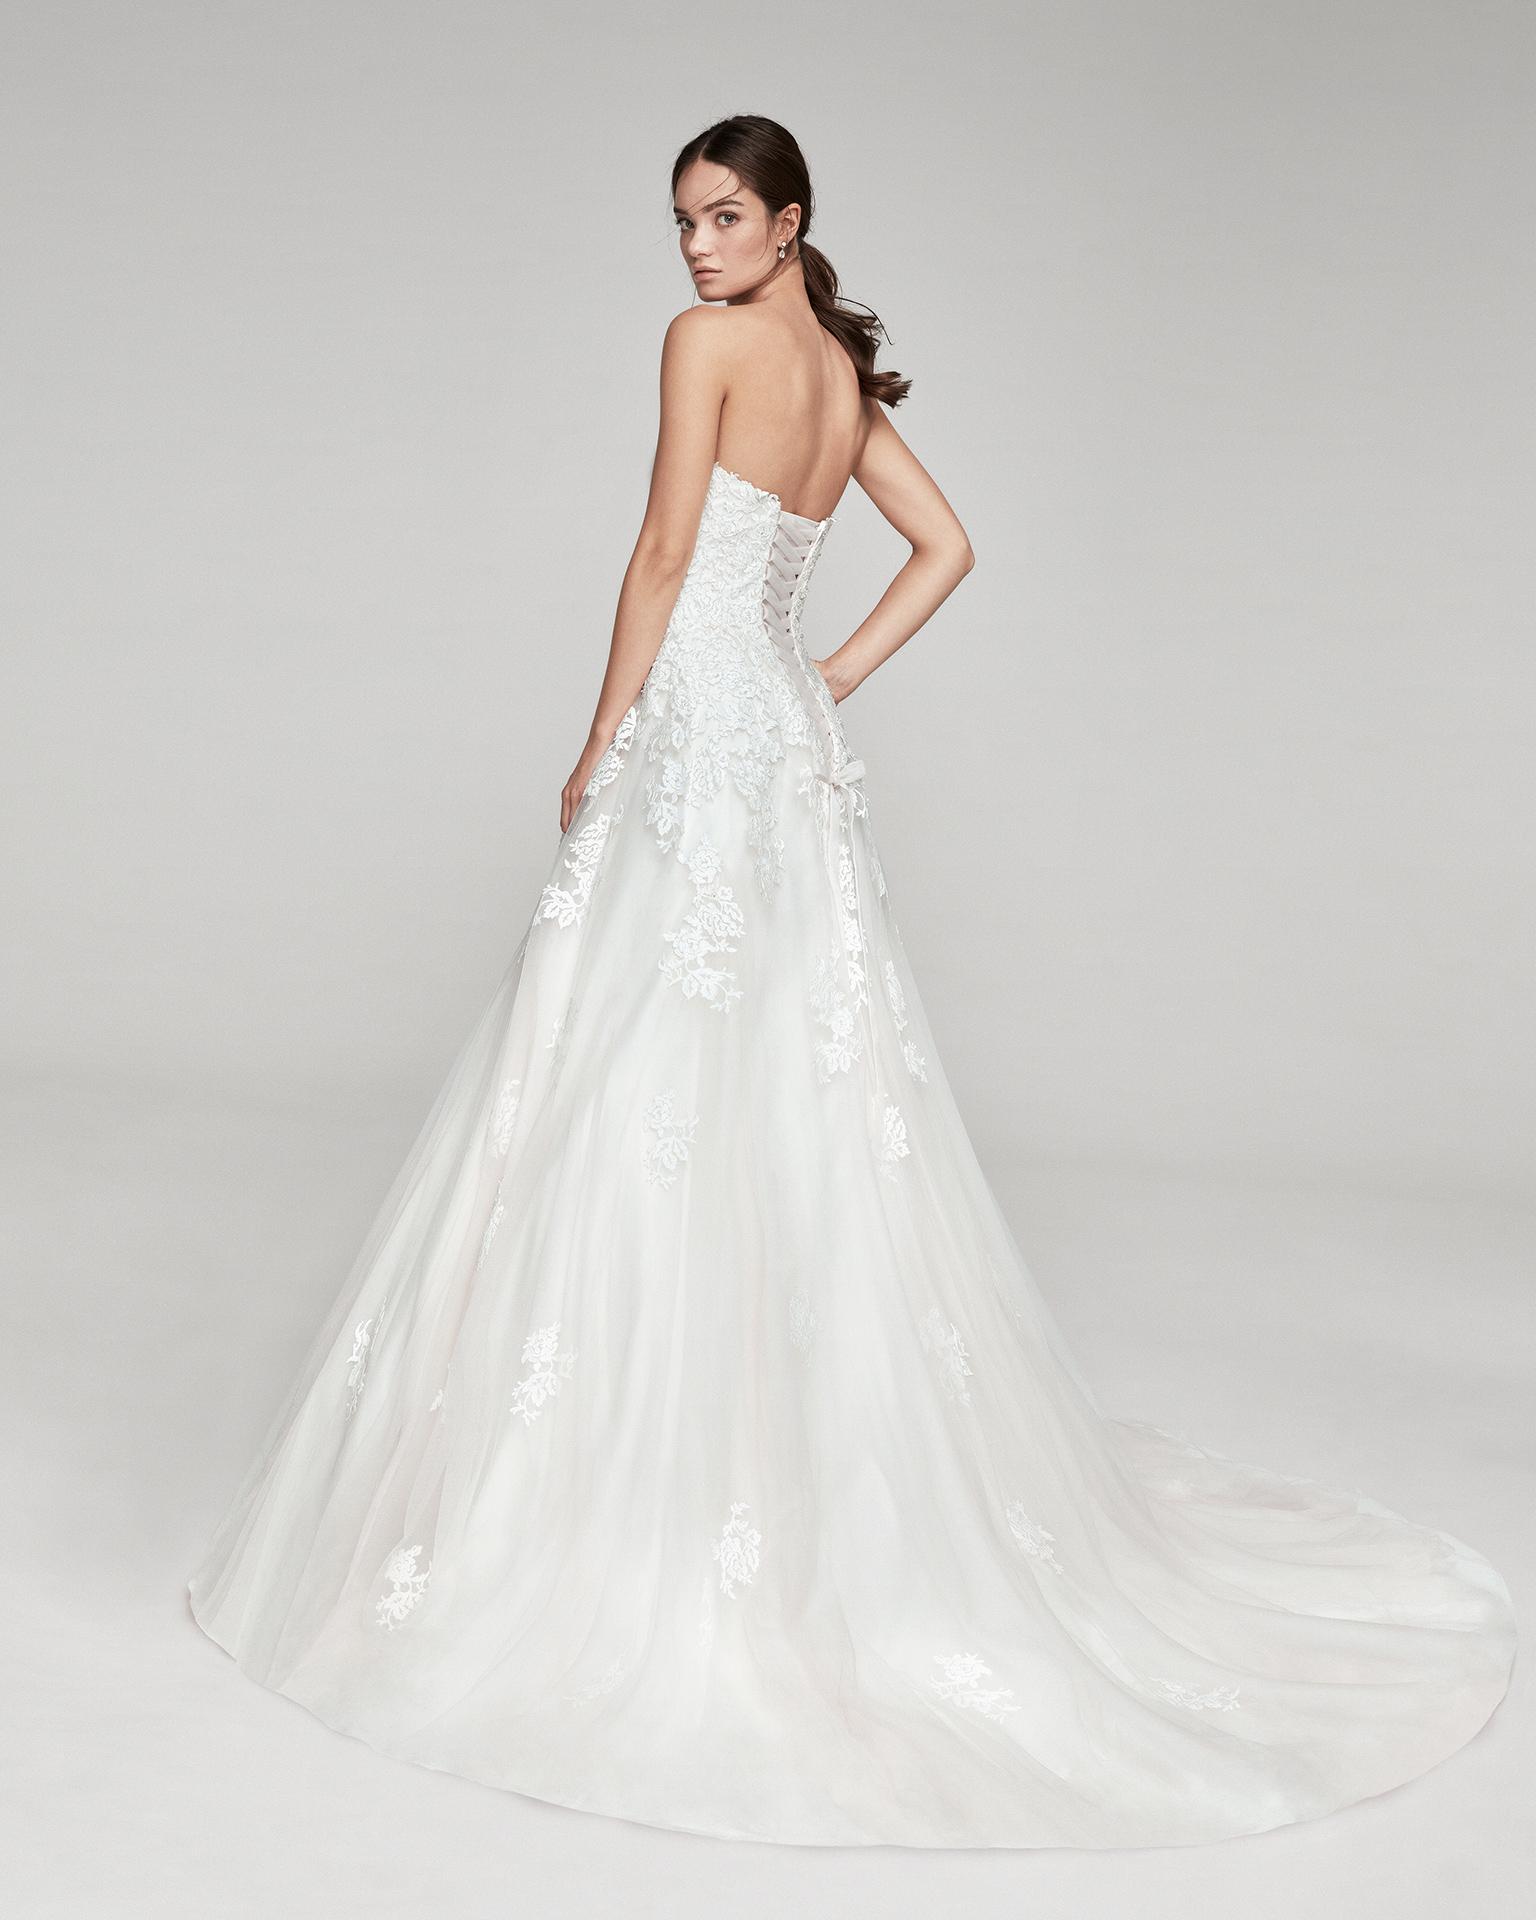 Taupe Bridal 2019 Alma Novia Collection